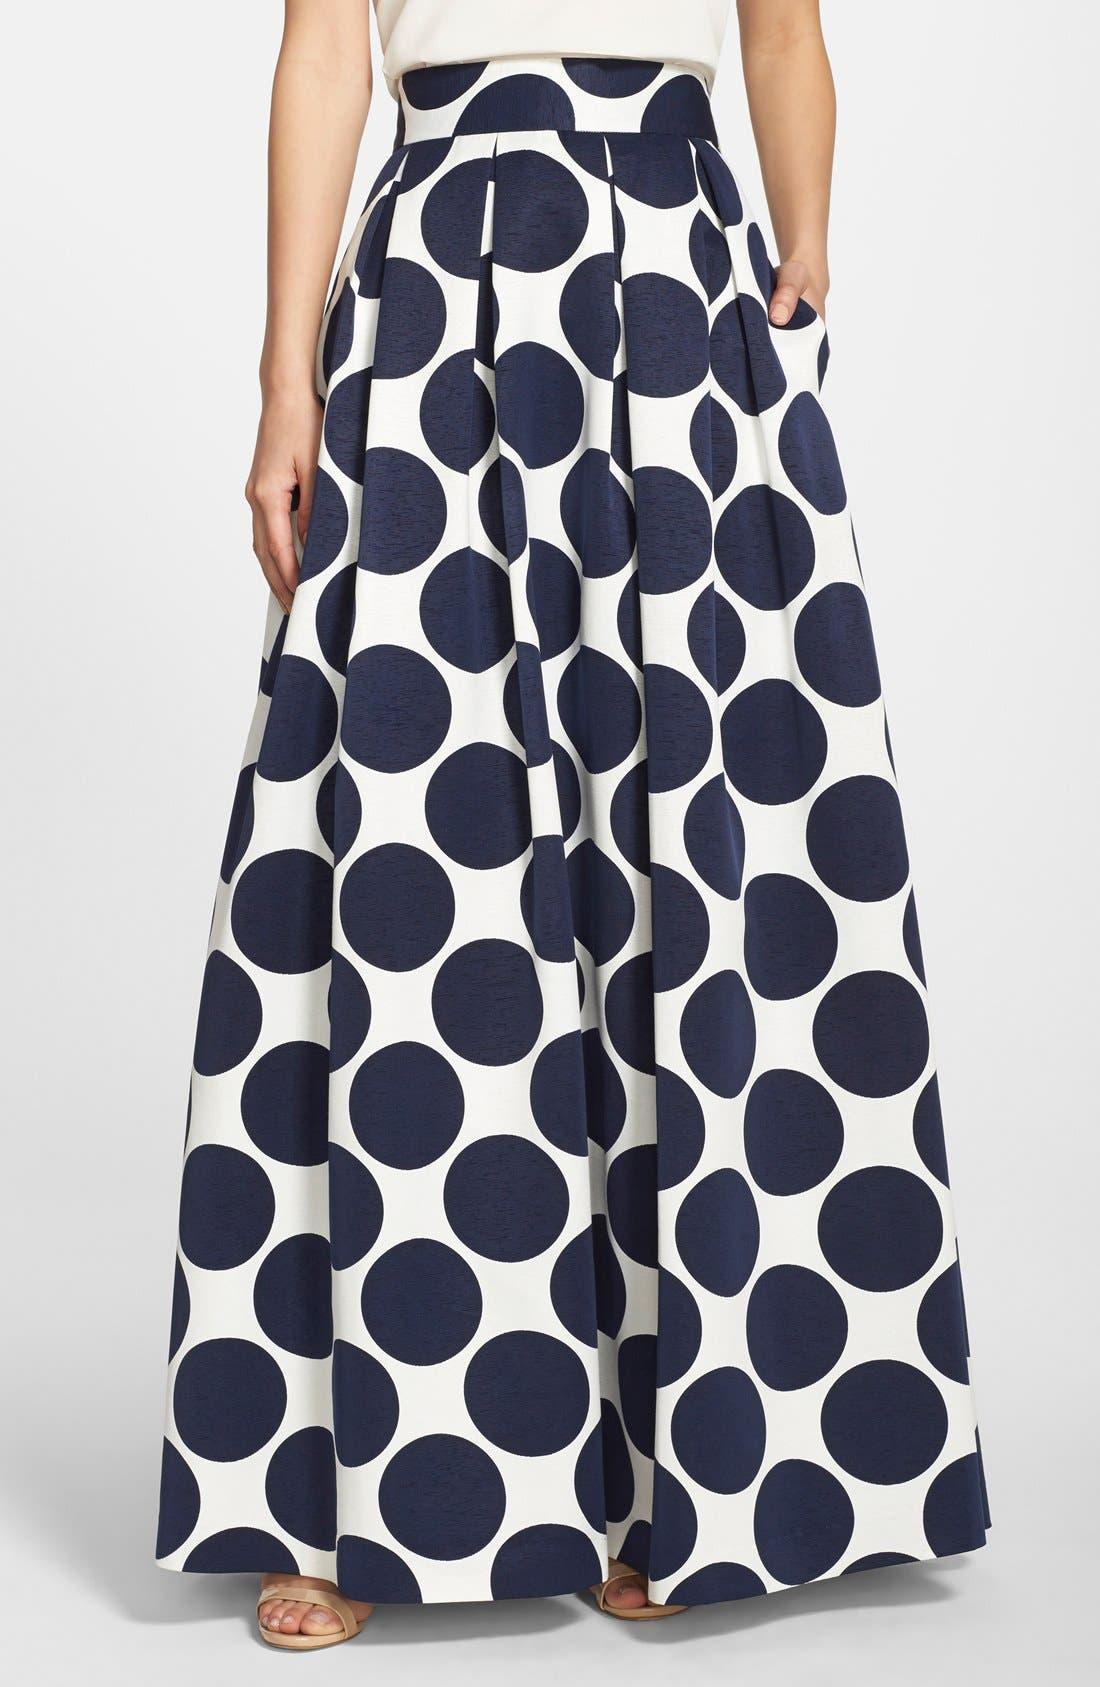 Pleated Dot Print Ball Skirt,                             Main thumbnail 1, color,                             Navy/ Ivory